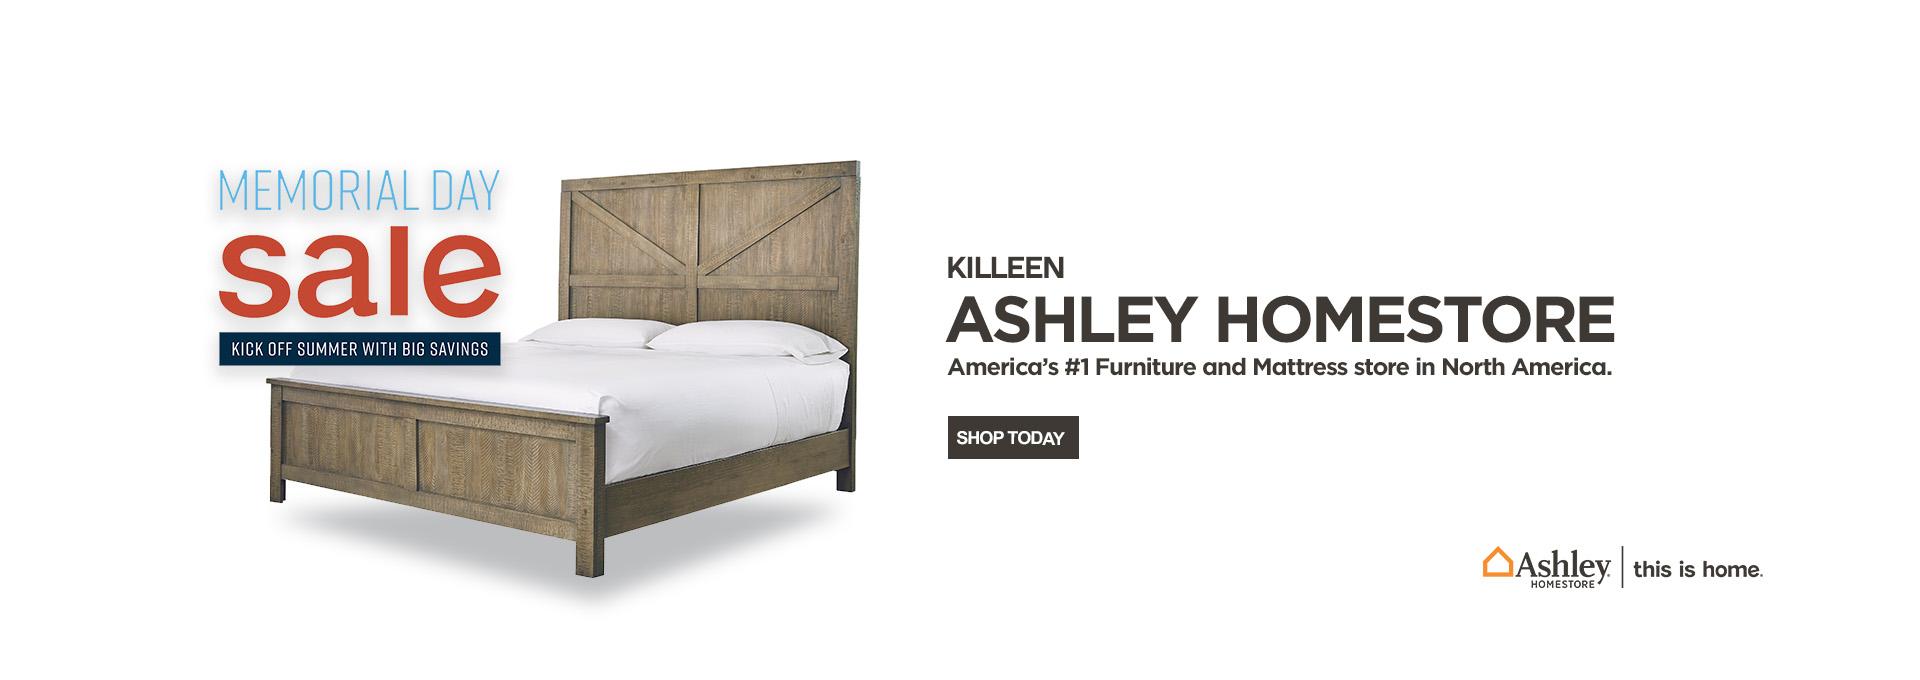 Ashley Homestore In Killeen Tx Furniture In Killeen